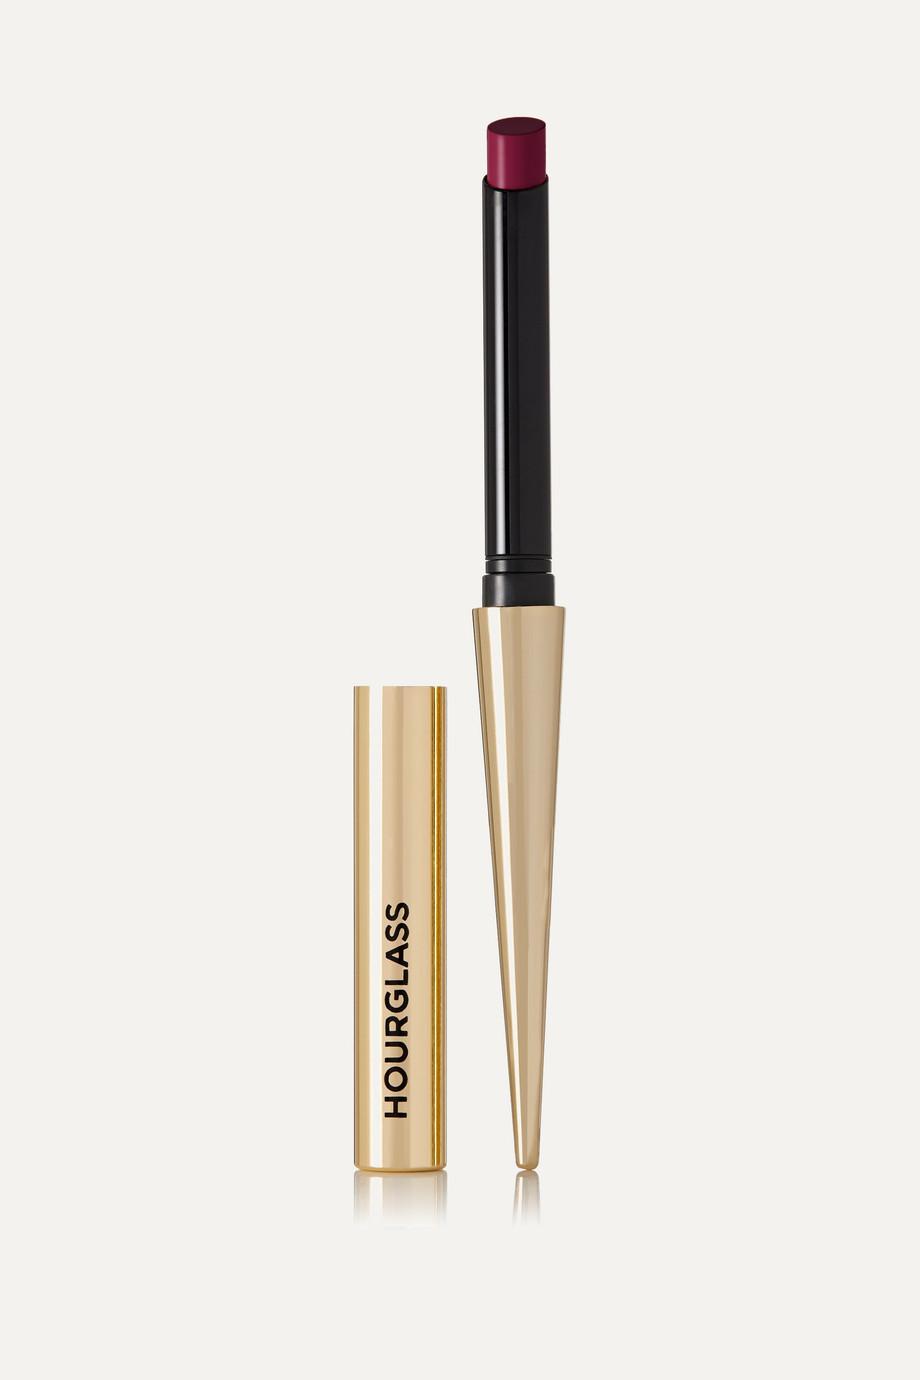 Hourglass Confession Ultra Slim High Intensity Lipstick – When I'm Alone – Lippenstift